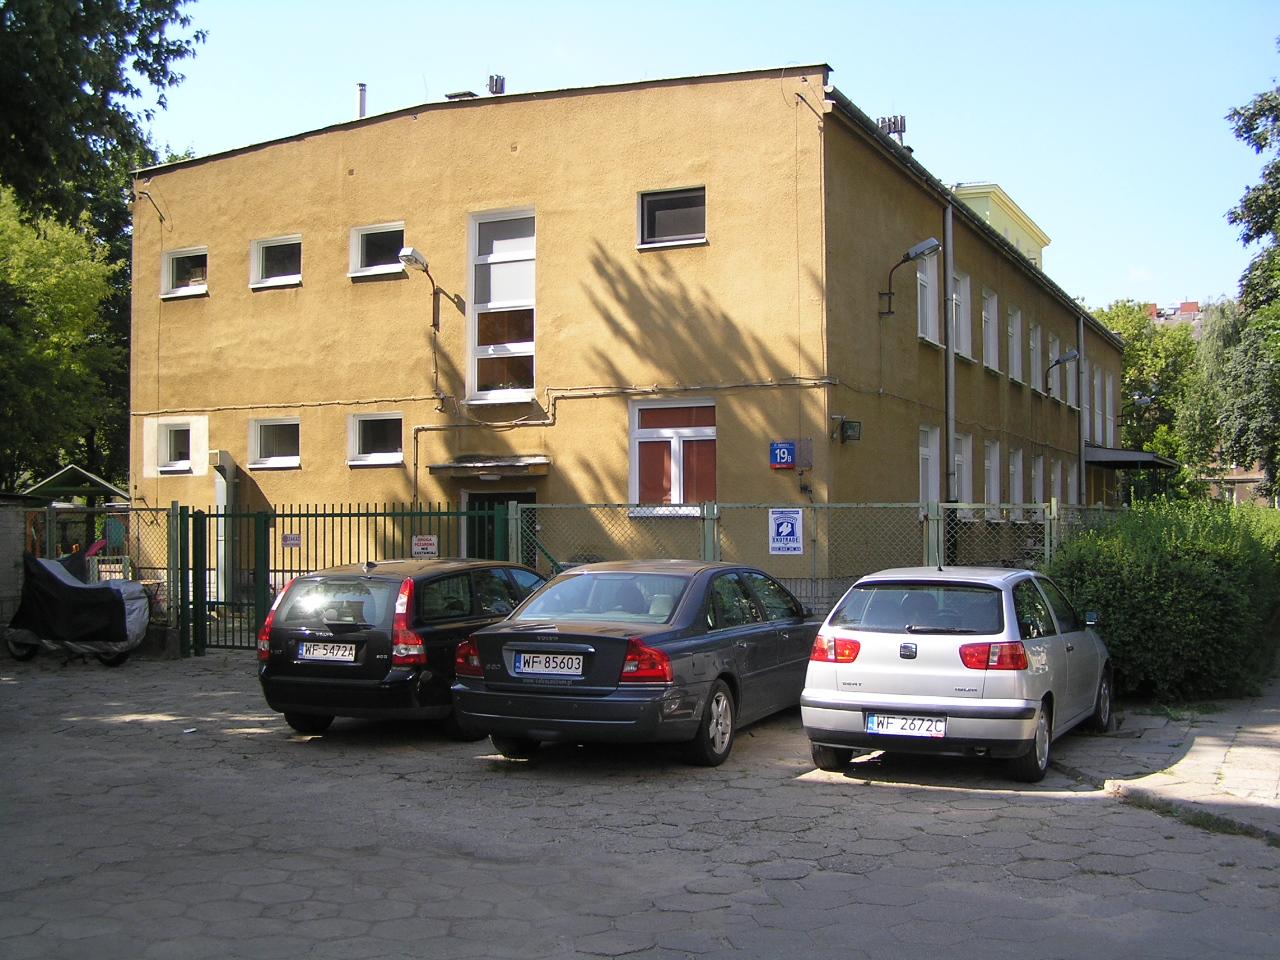 Siennicka 19B